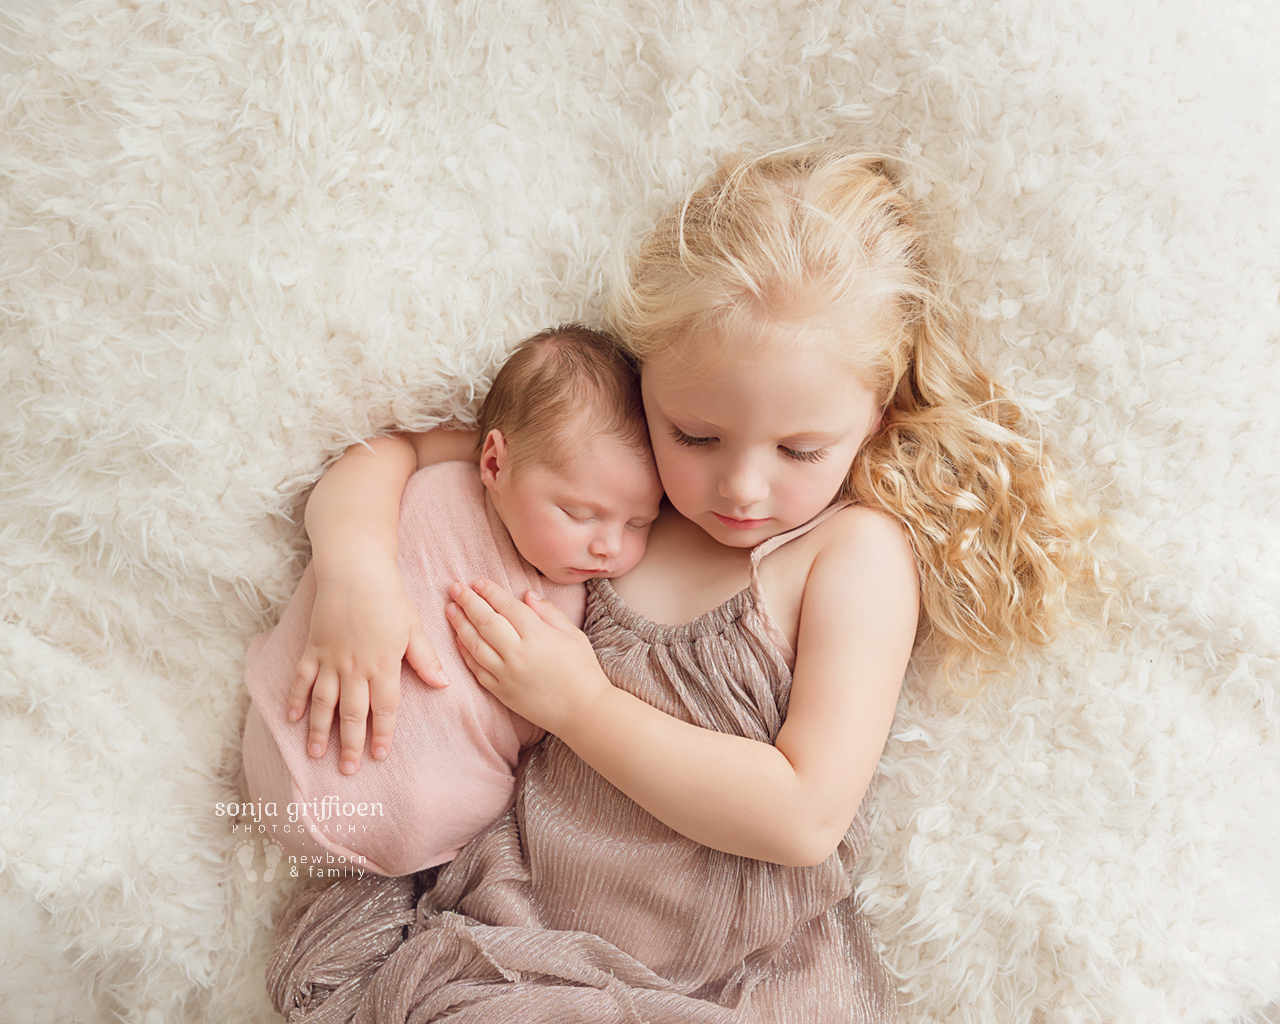 Olivia-O-Newborn-Brisbane-Newborn-Photographer-Sonja-Griffioen-01.jpg